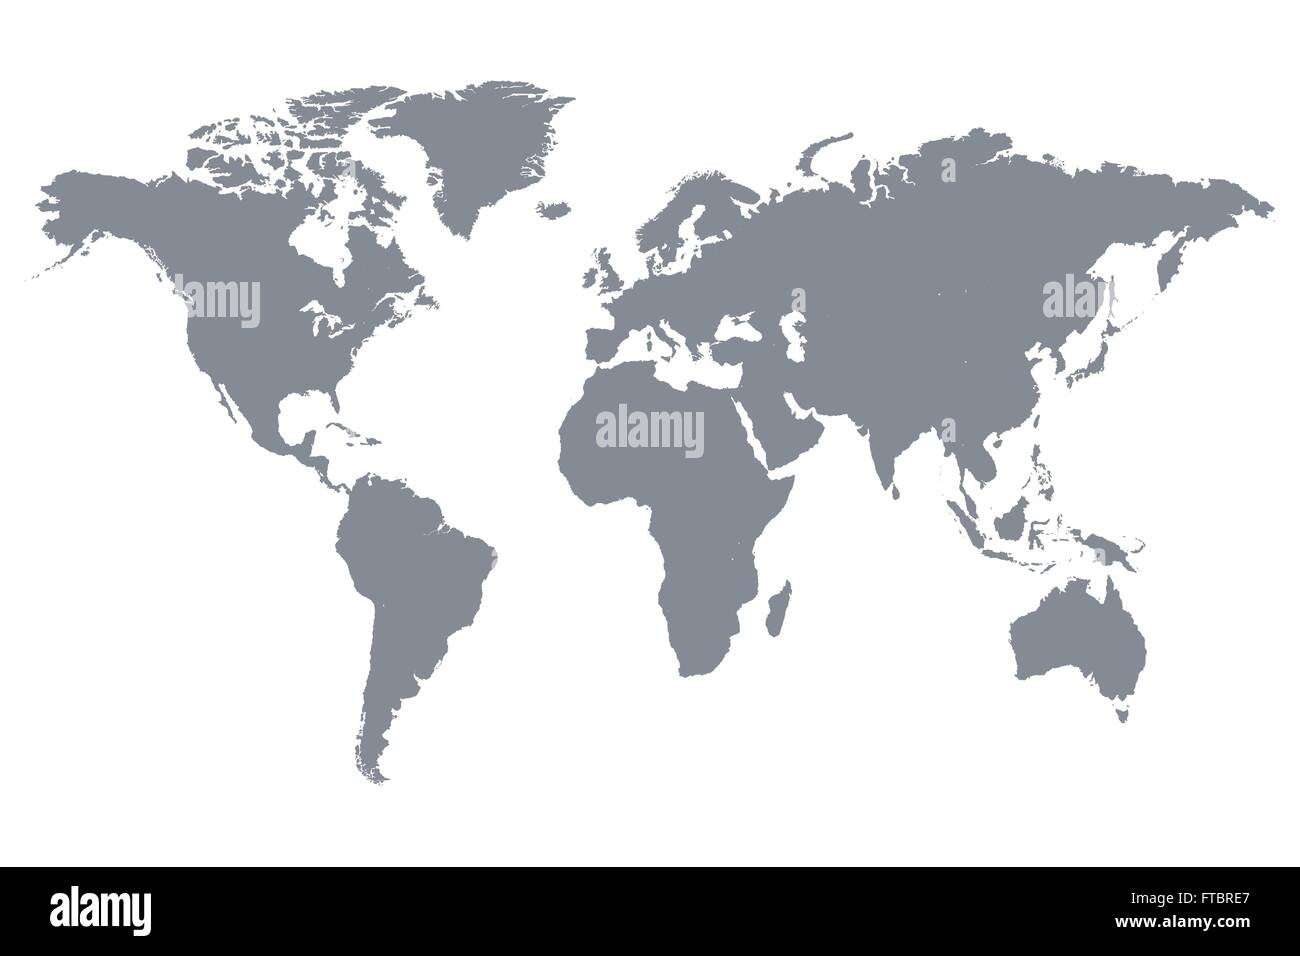 Grey world map vector illustration stock vector art illustration grey world map vector illustration gumiabroncs Choice Image